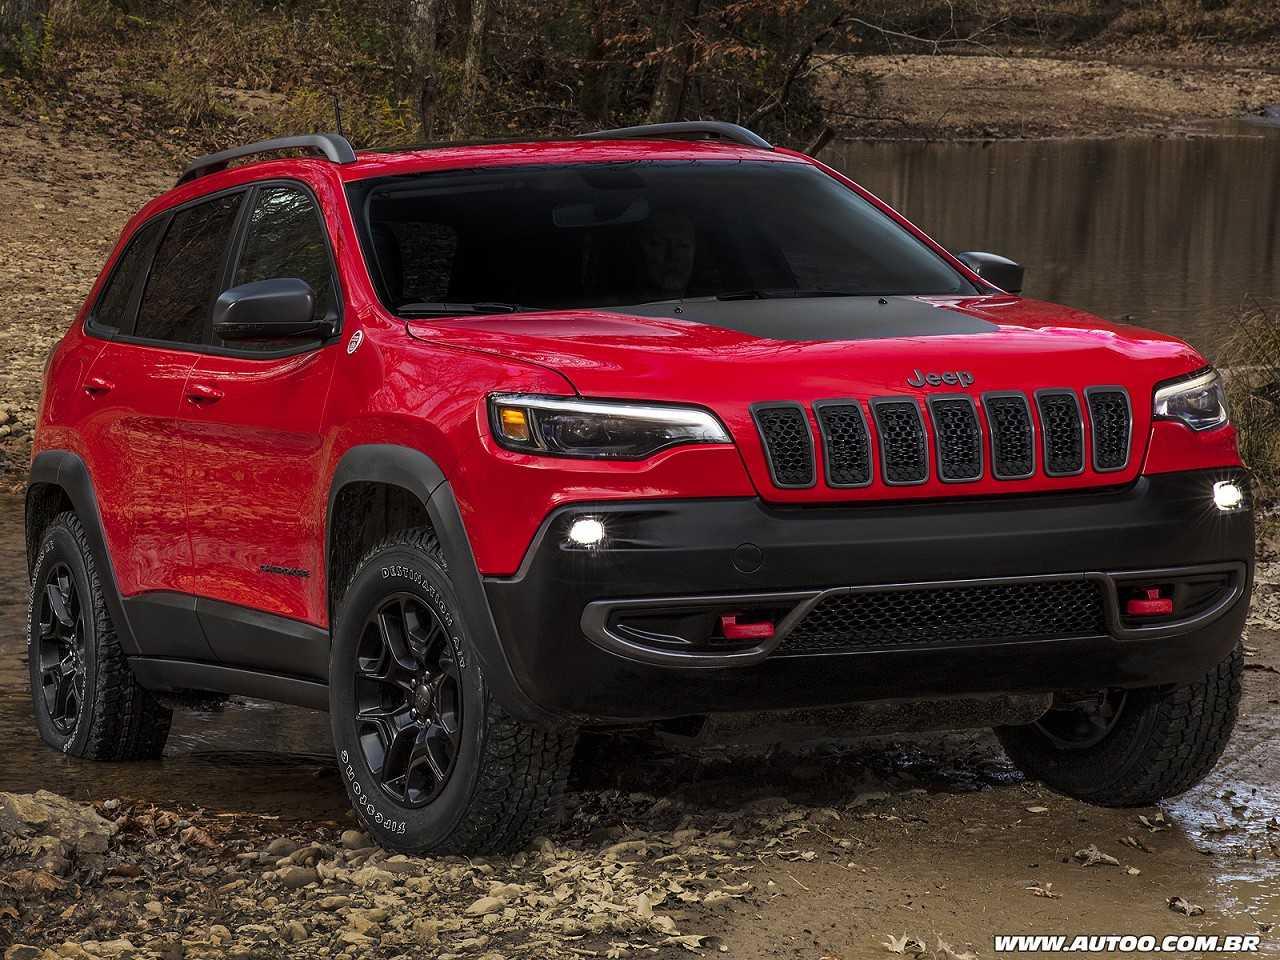 Jeep Cherokee Autoo